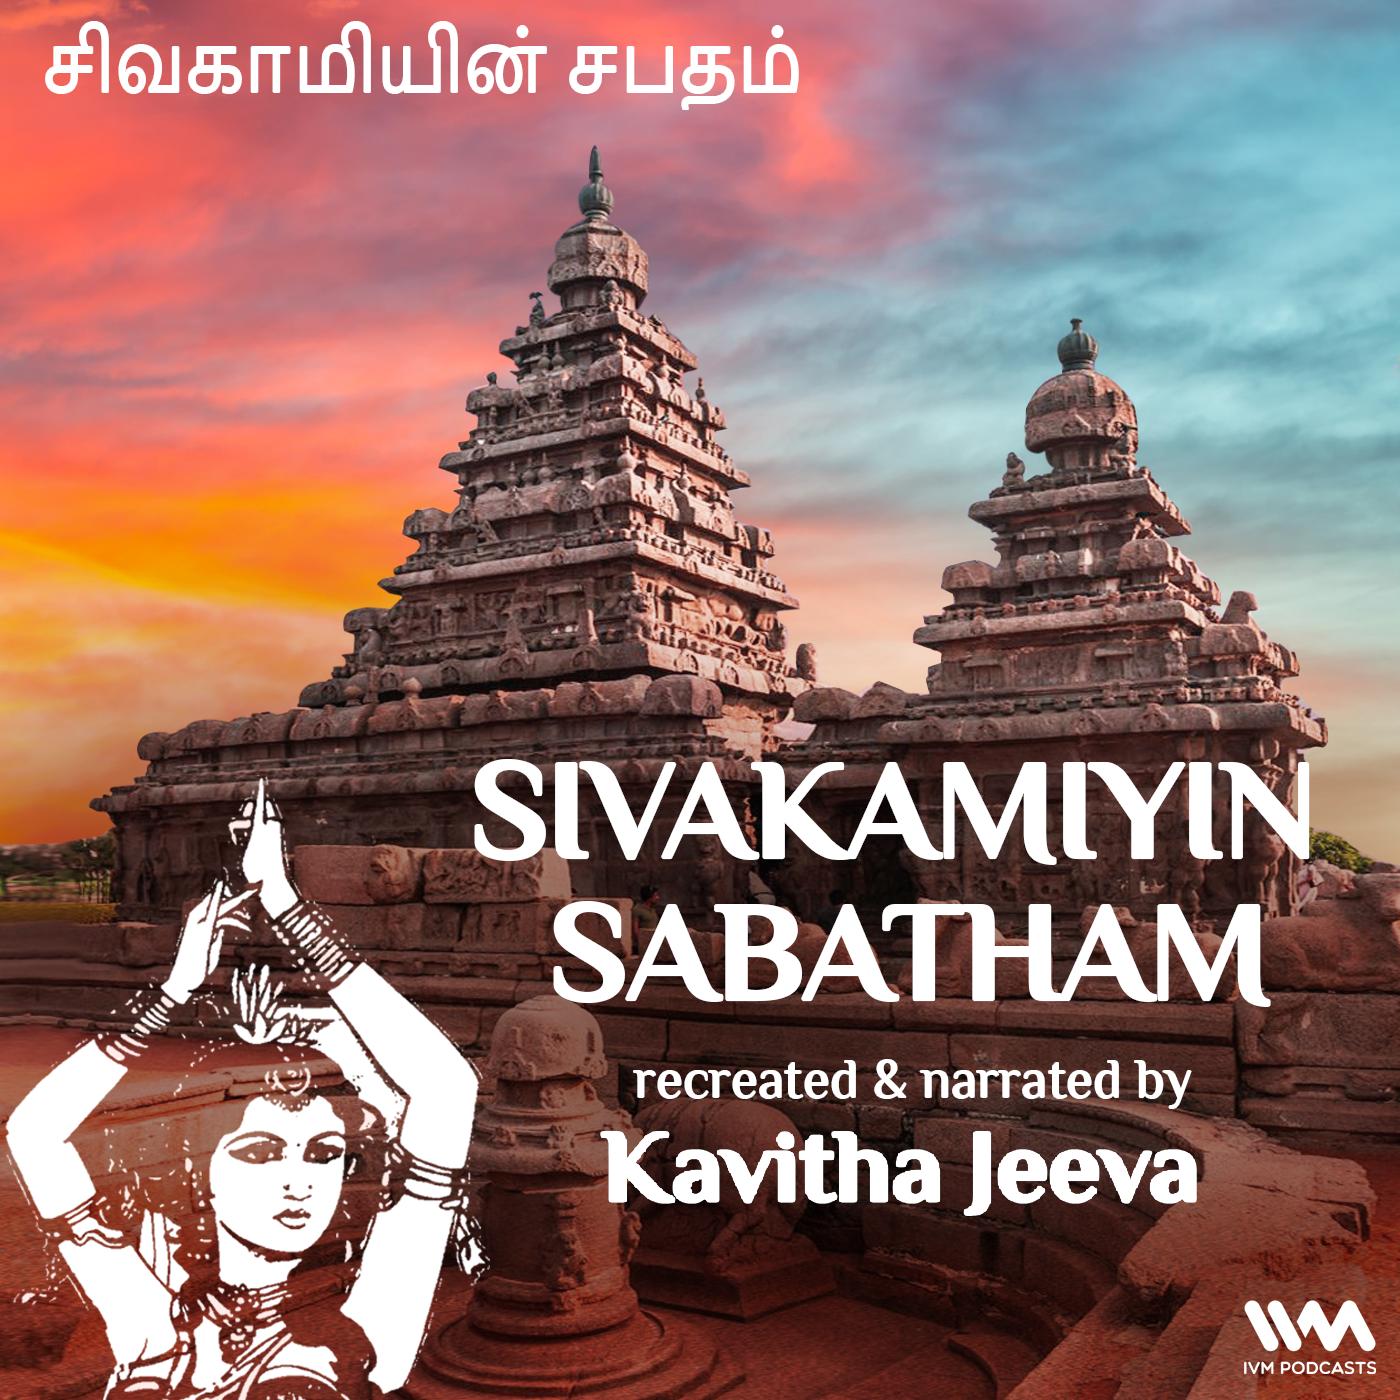 Sivakamiyin Sabatham - Announcement